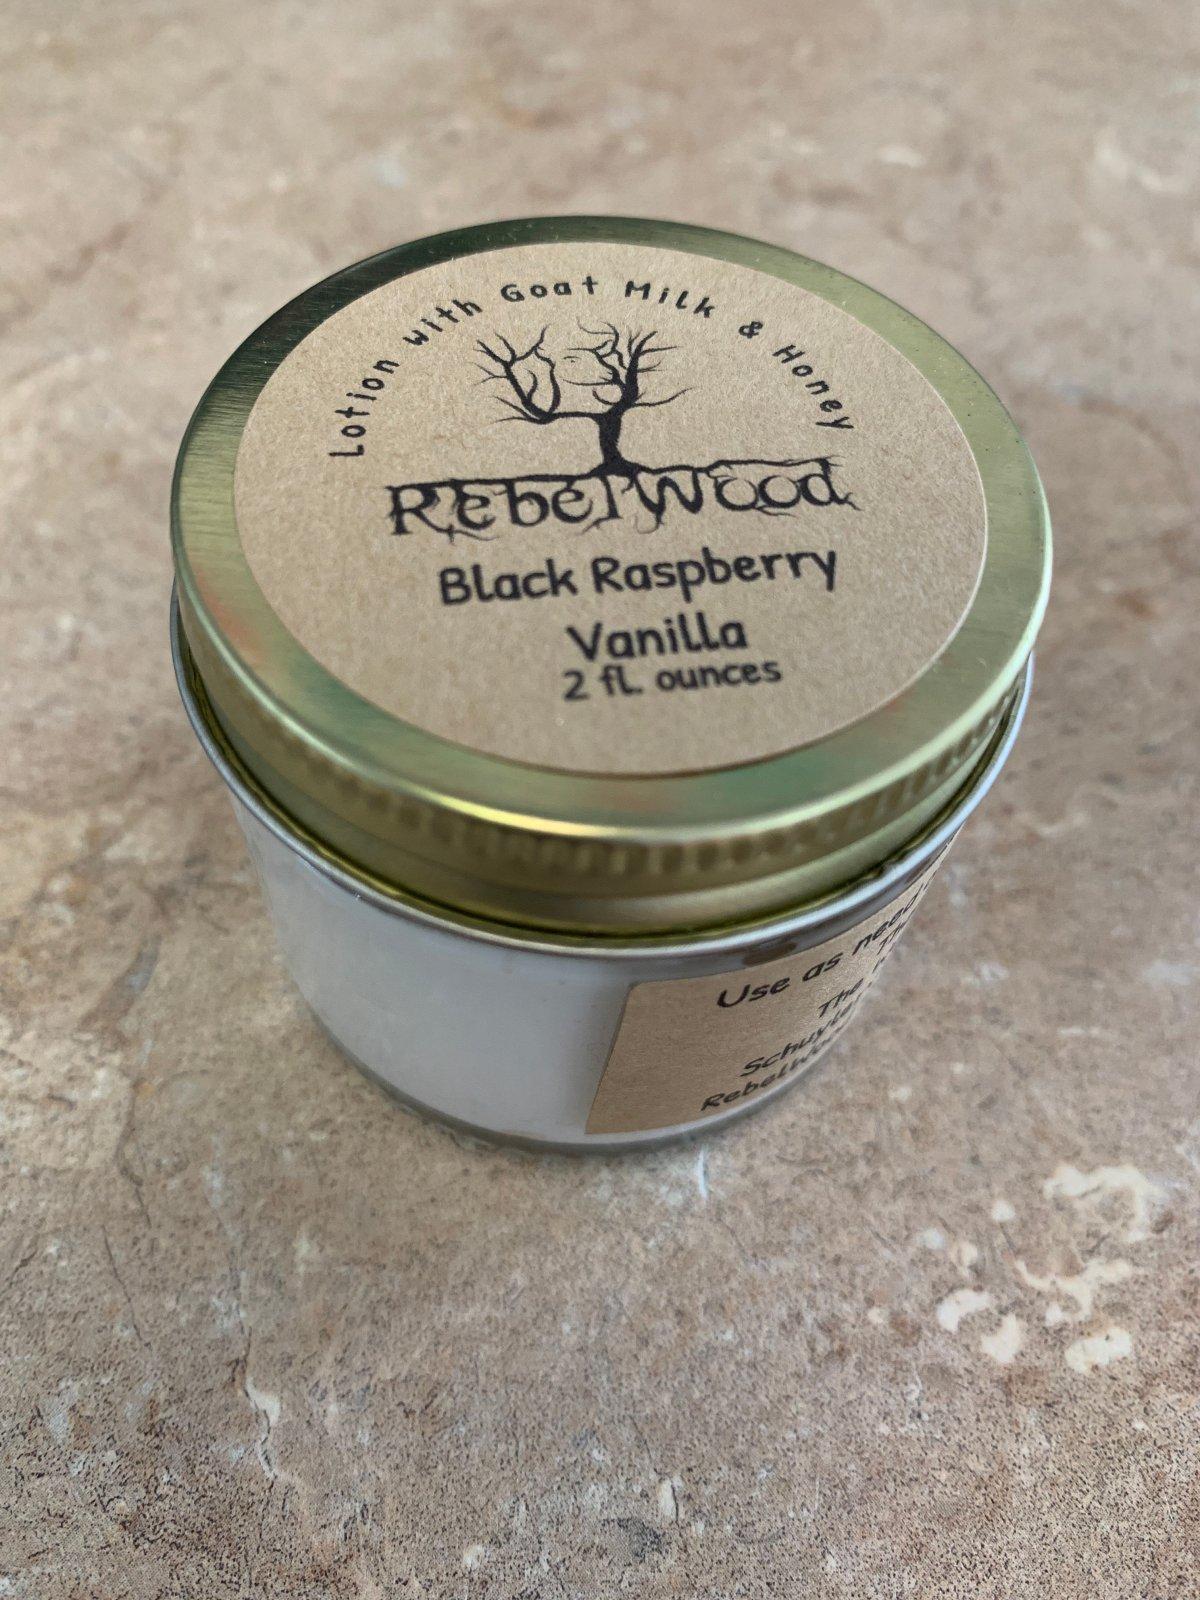 Rebelwood Black Raspberry and Vanilla Hand  Balm